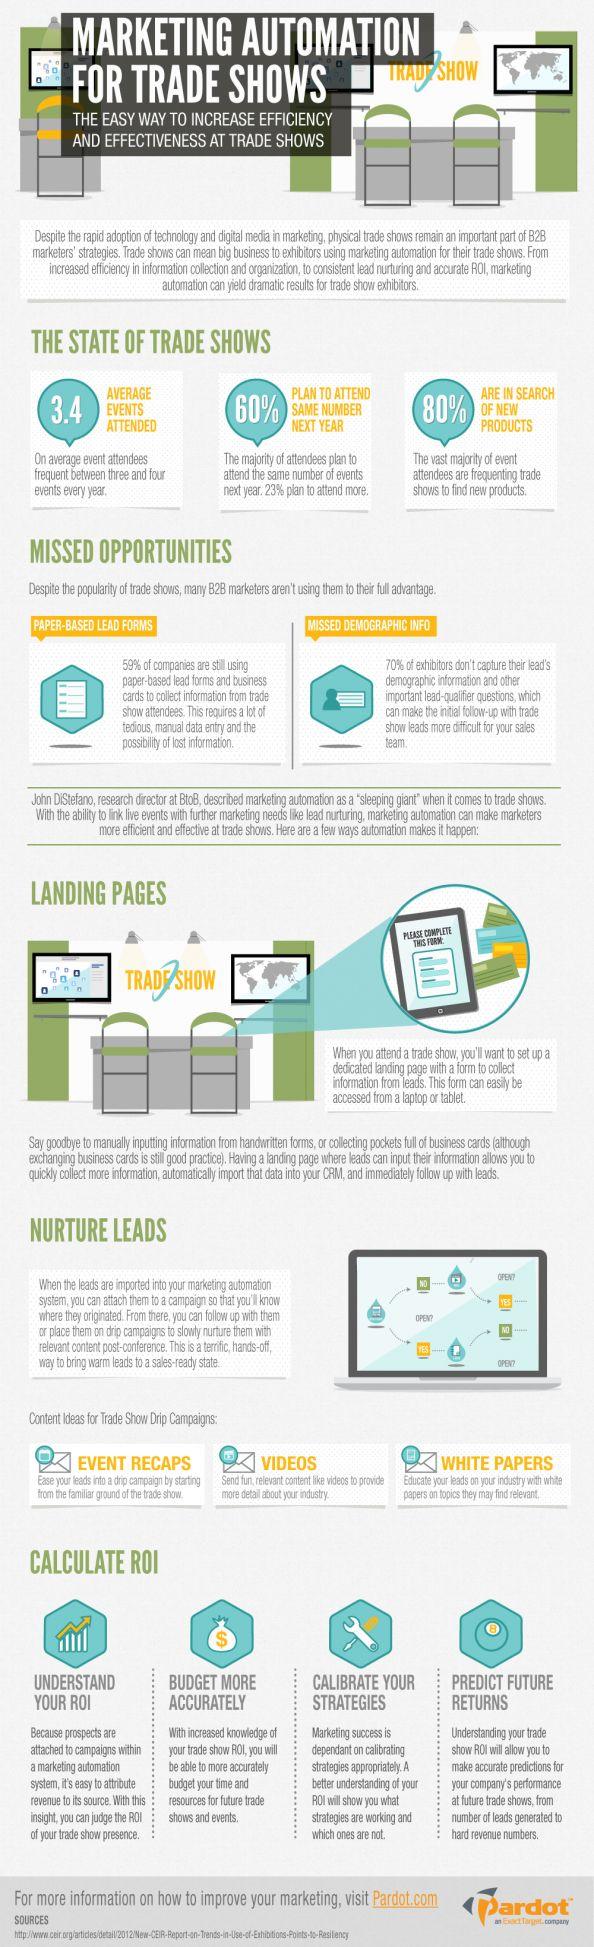 Infographic: Marketing automation for trade shows  #tradeshow #eventprofs #meetingprofs  kalaharimeetings.com